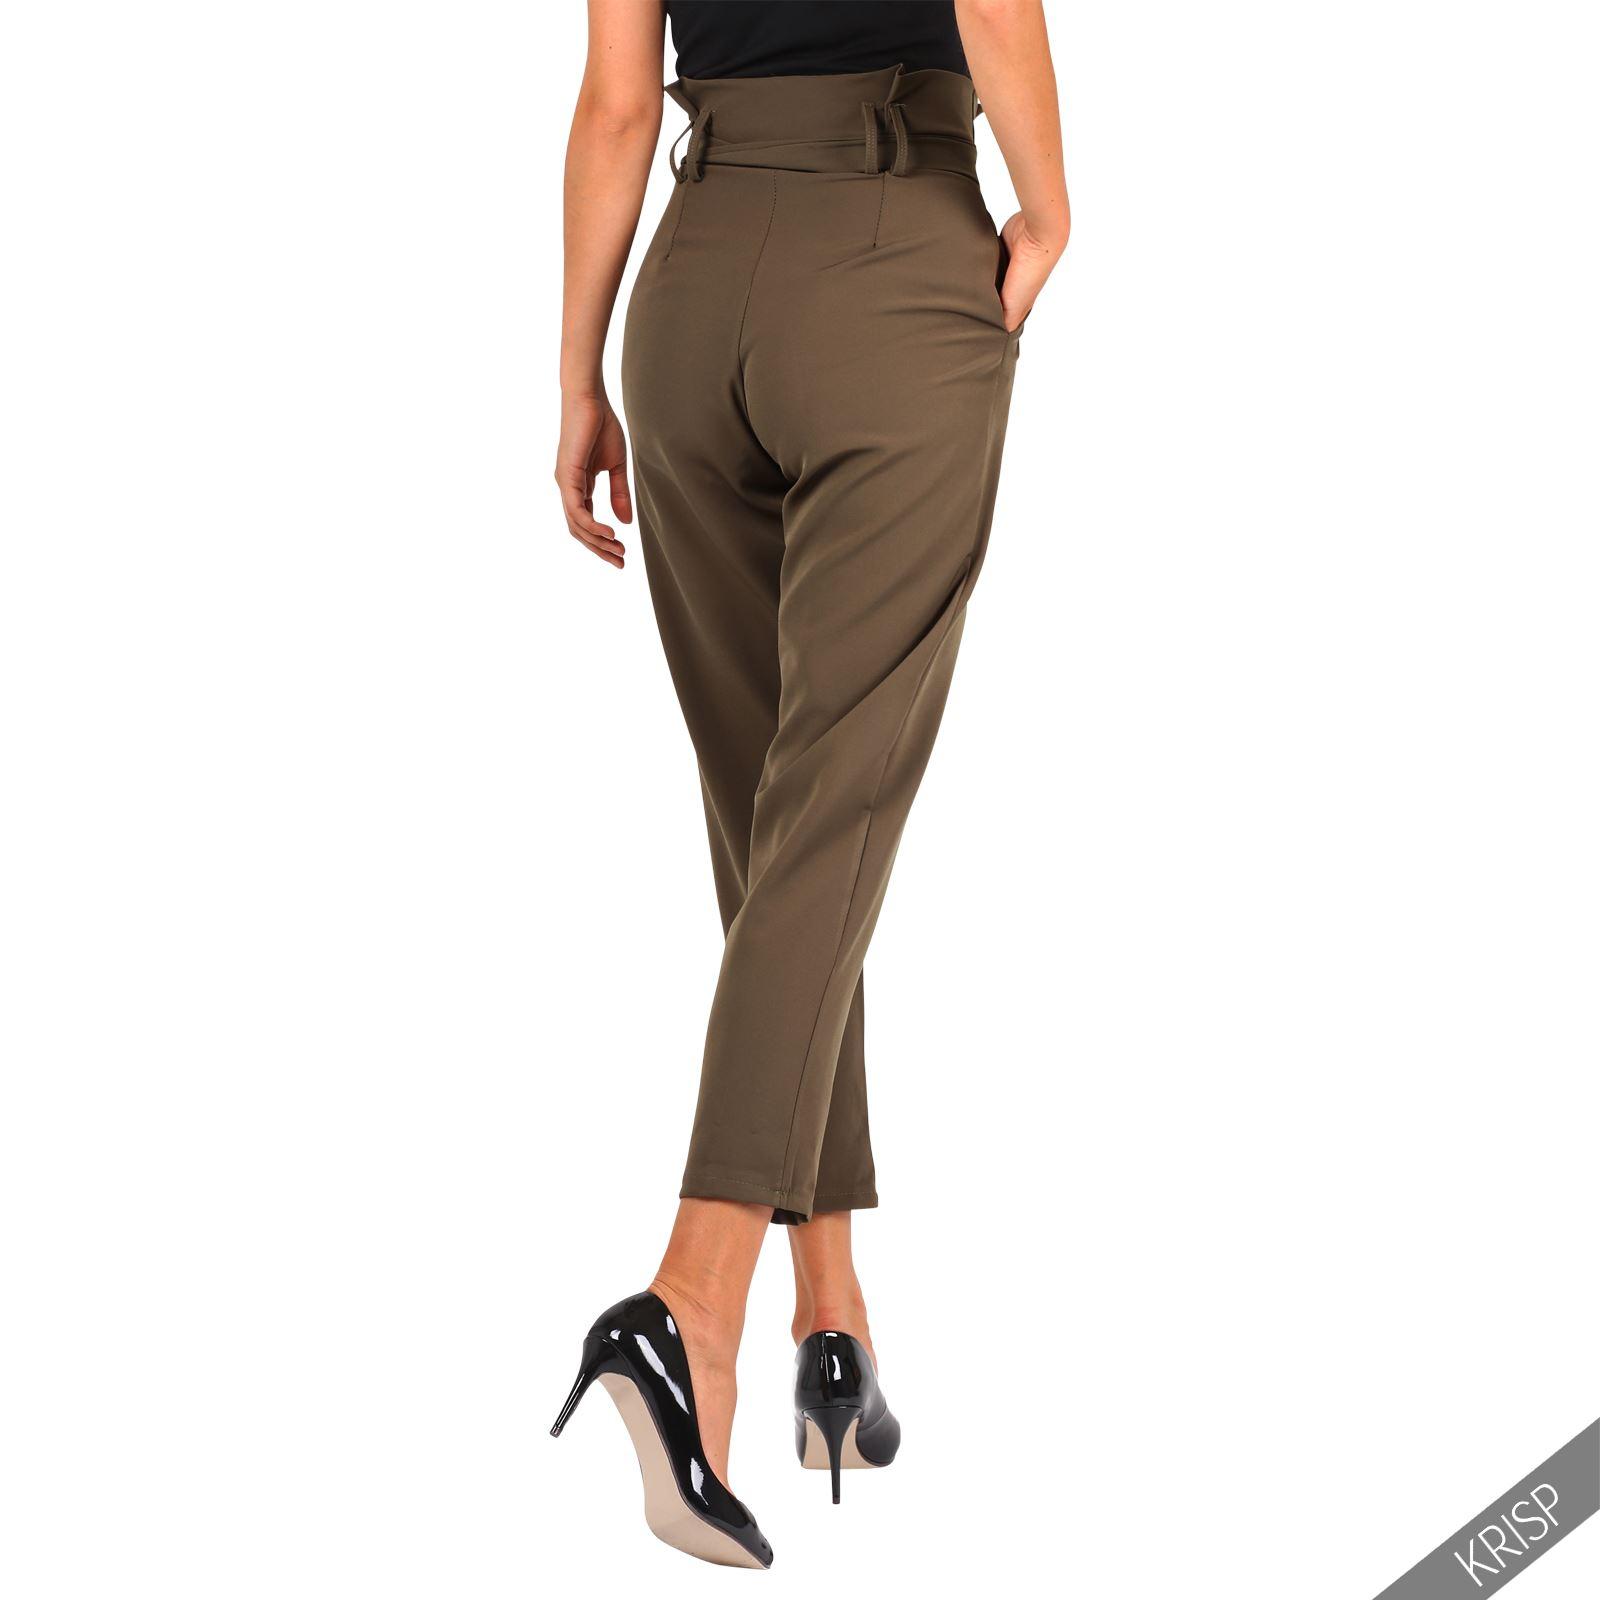 Women Formal Business Ruffle High Waist Pencil Trousers Pants SkinnyWork Office | EBay